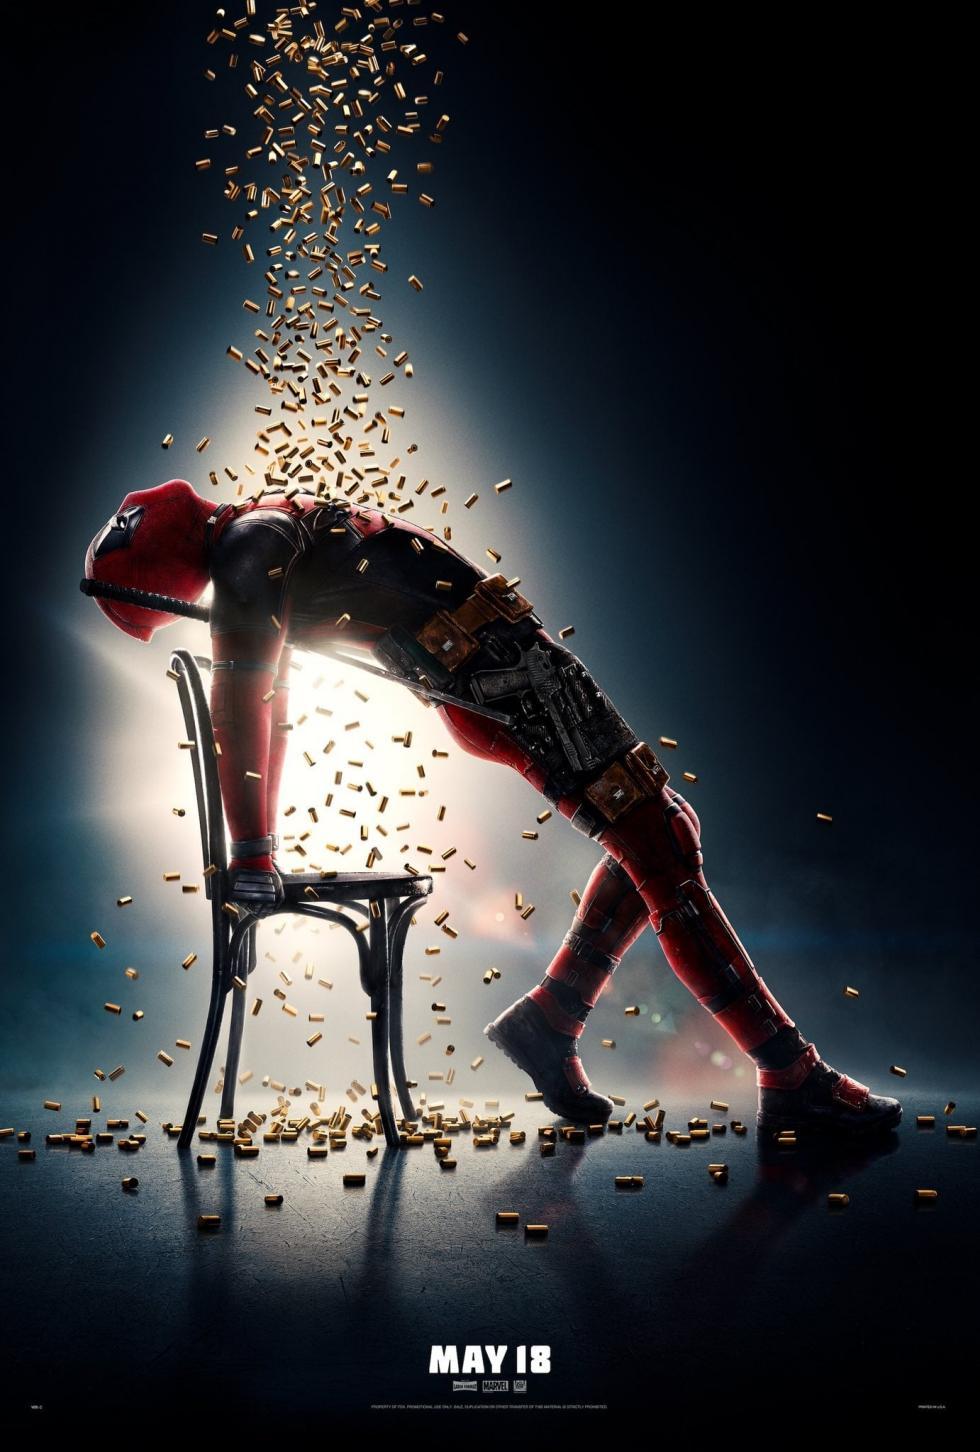 Marvel Deadpool Ausmalbilder Gratis: Peliculas Y Series